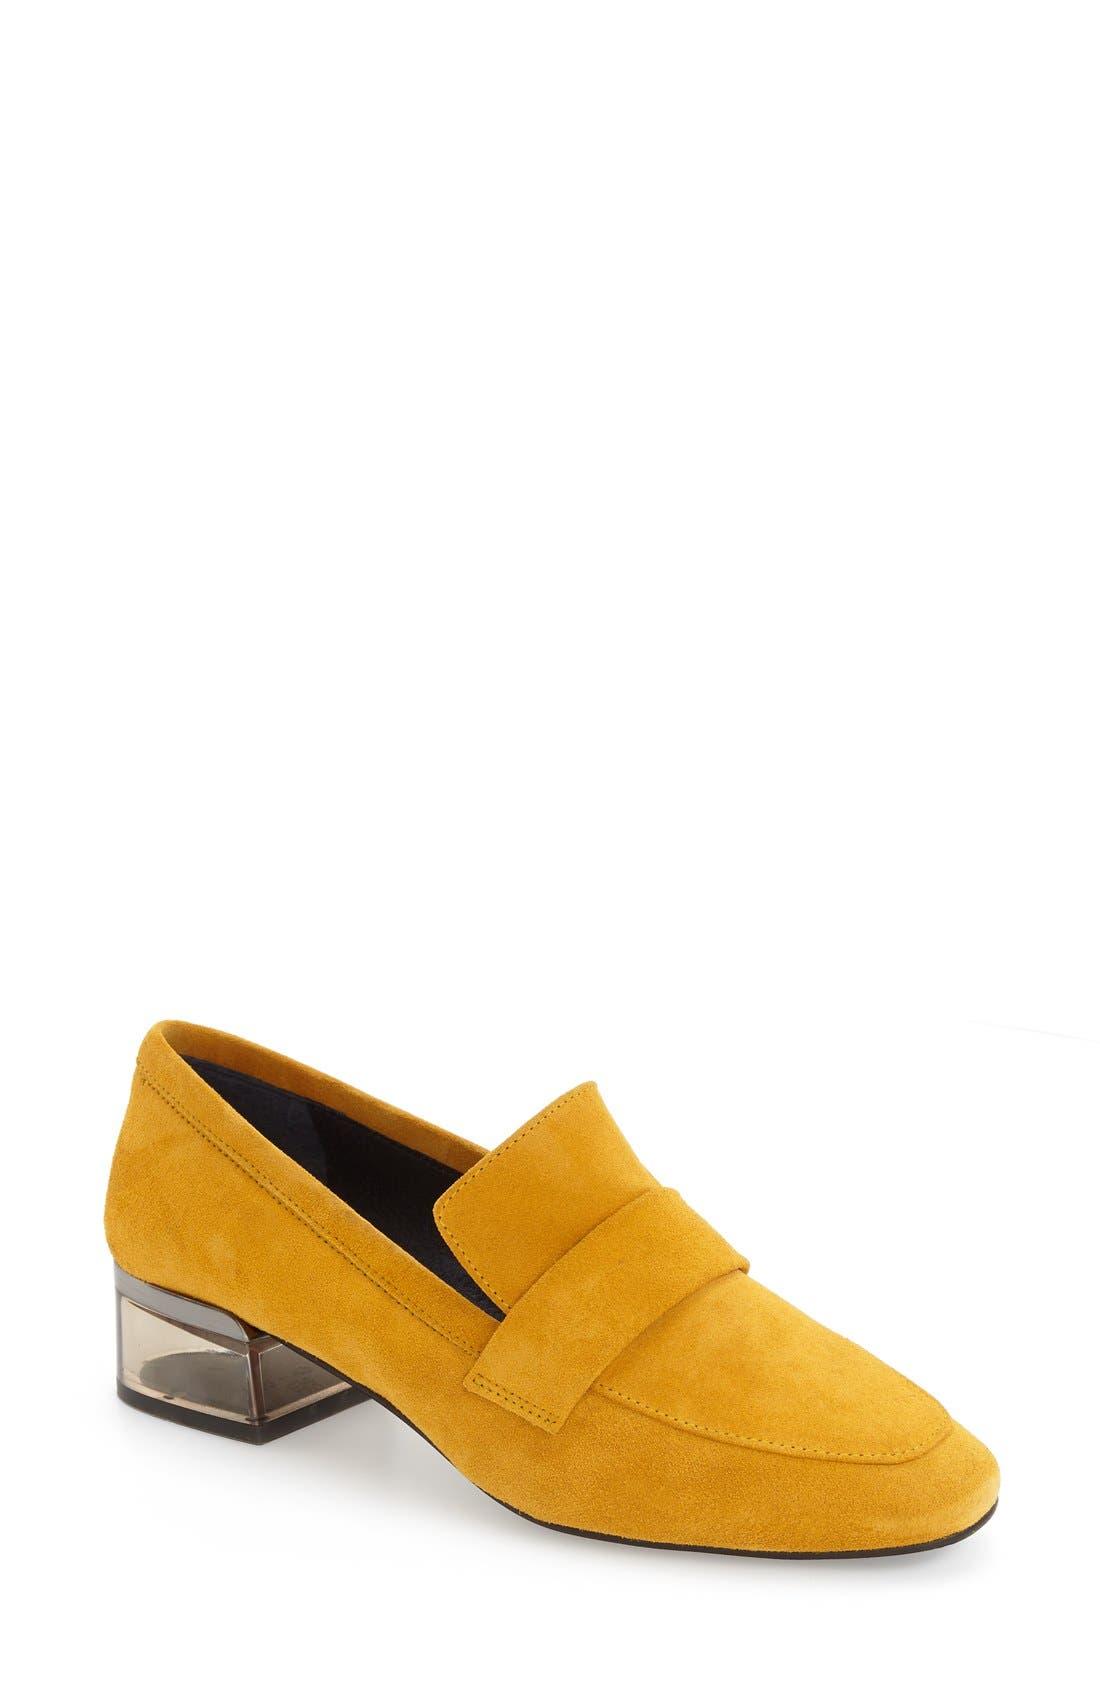 Main Image - Topshop 'Karrot' Clear Heel Loafer (Women)